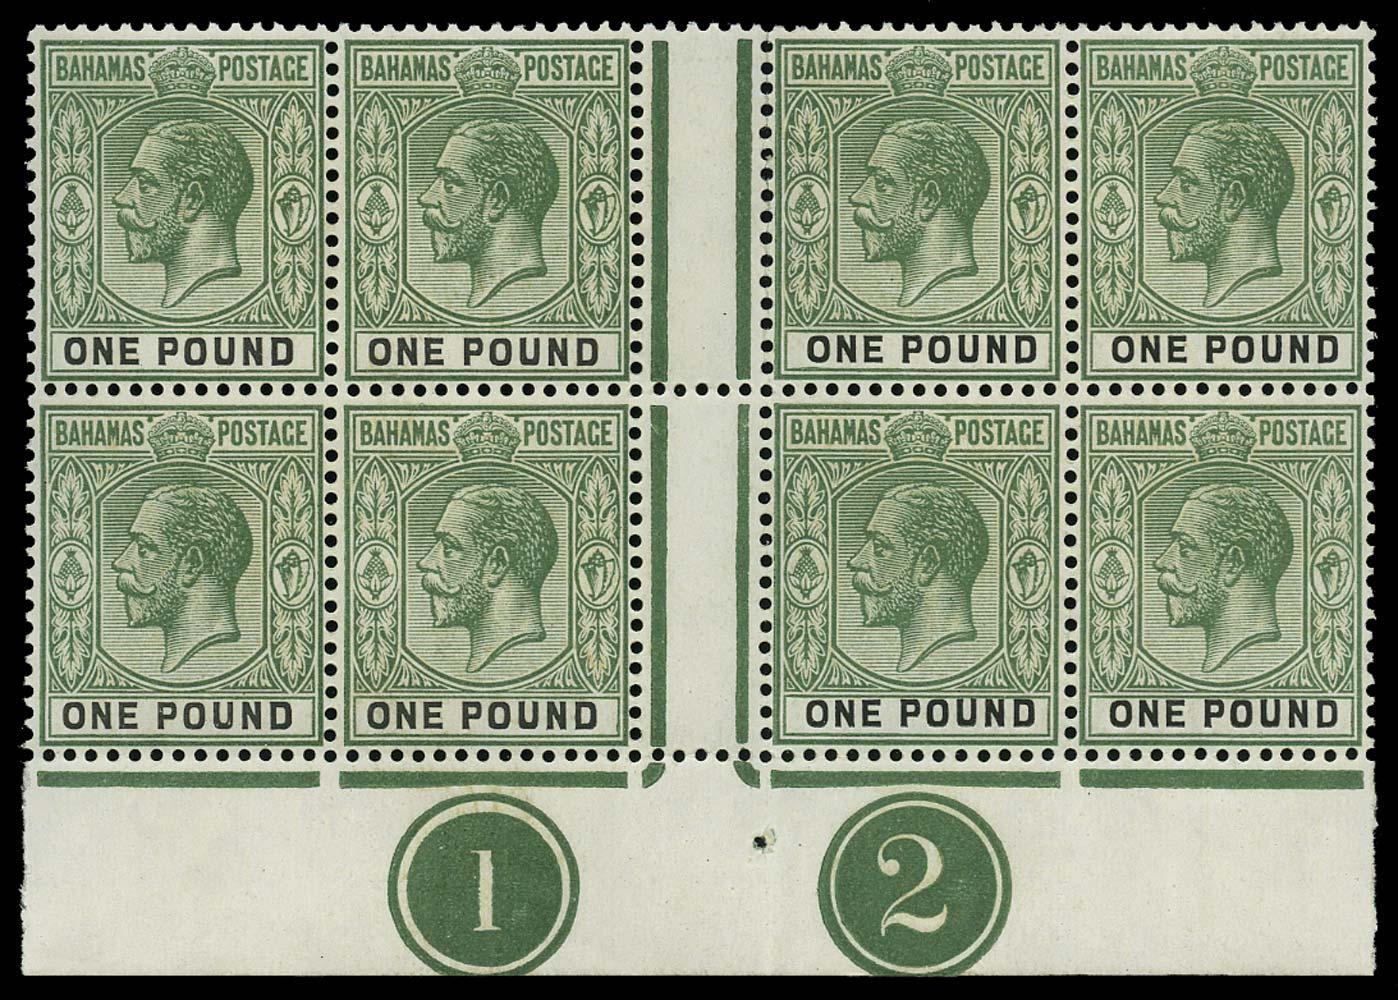 BAHAMAS 1921  SG125 Mint